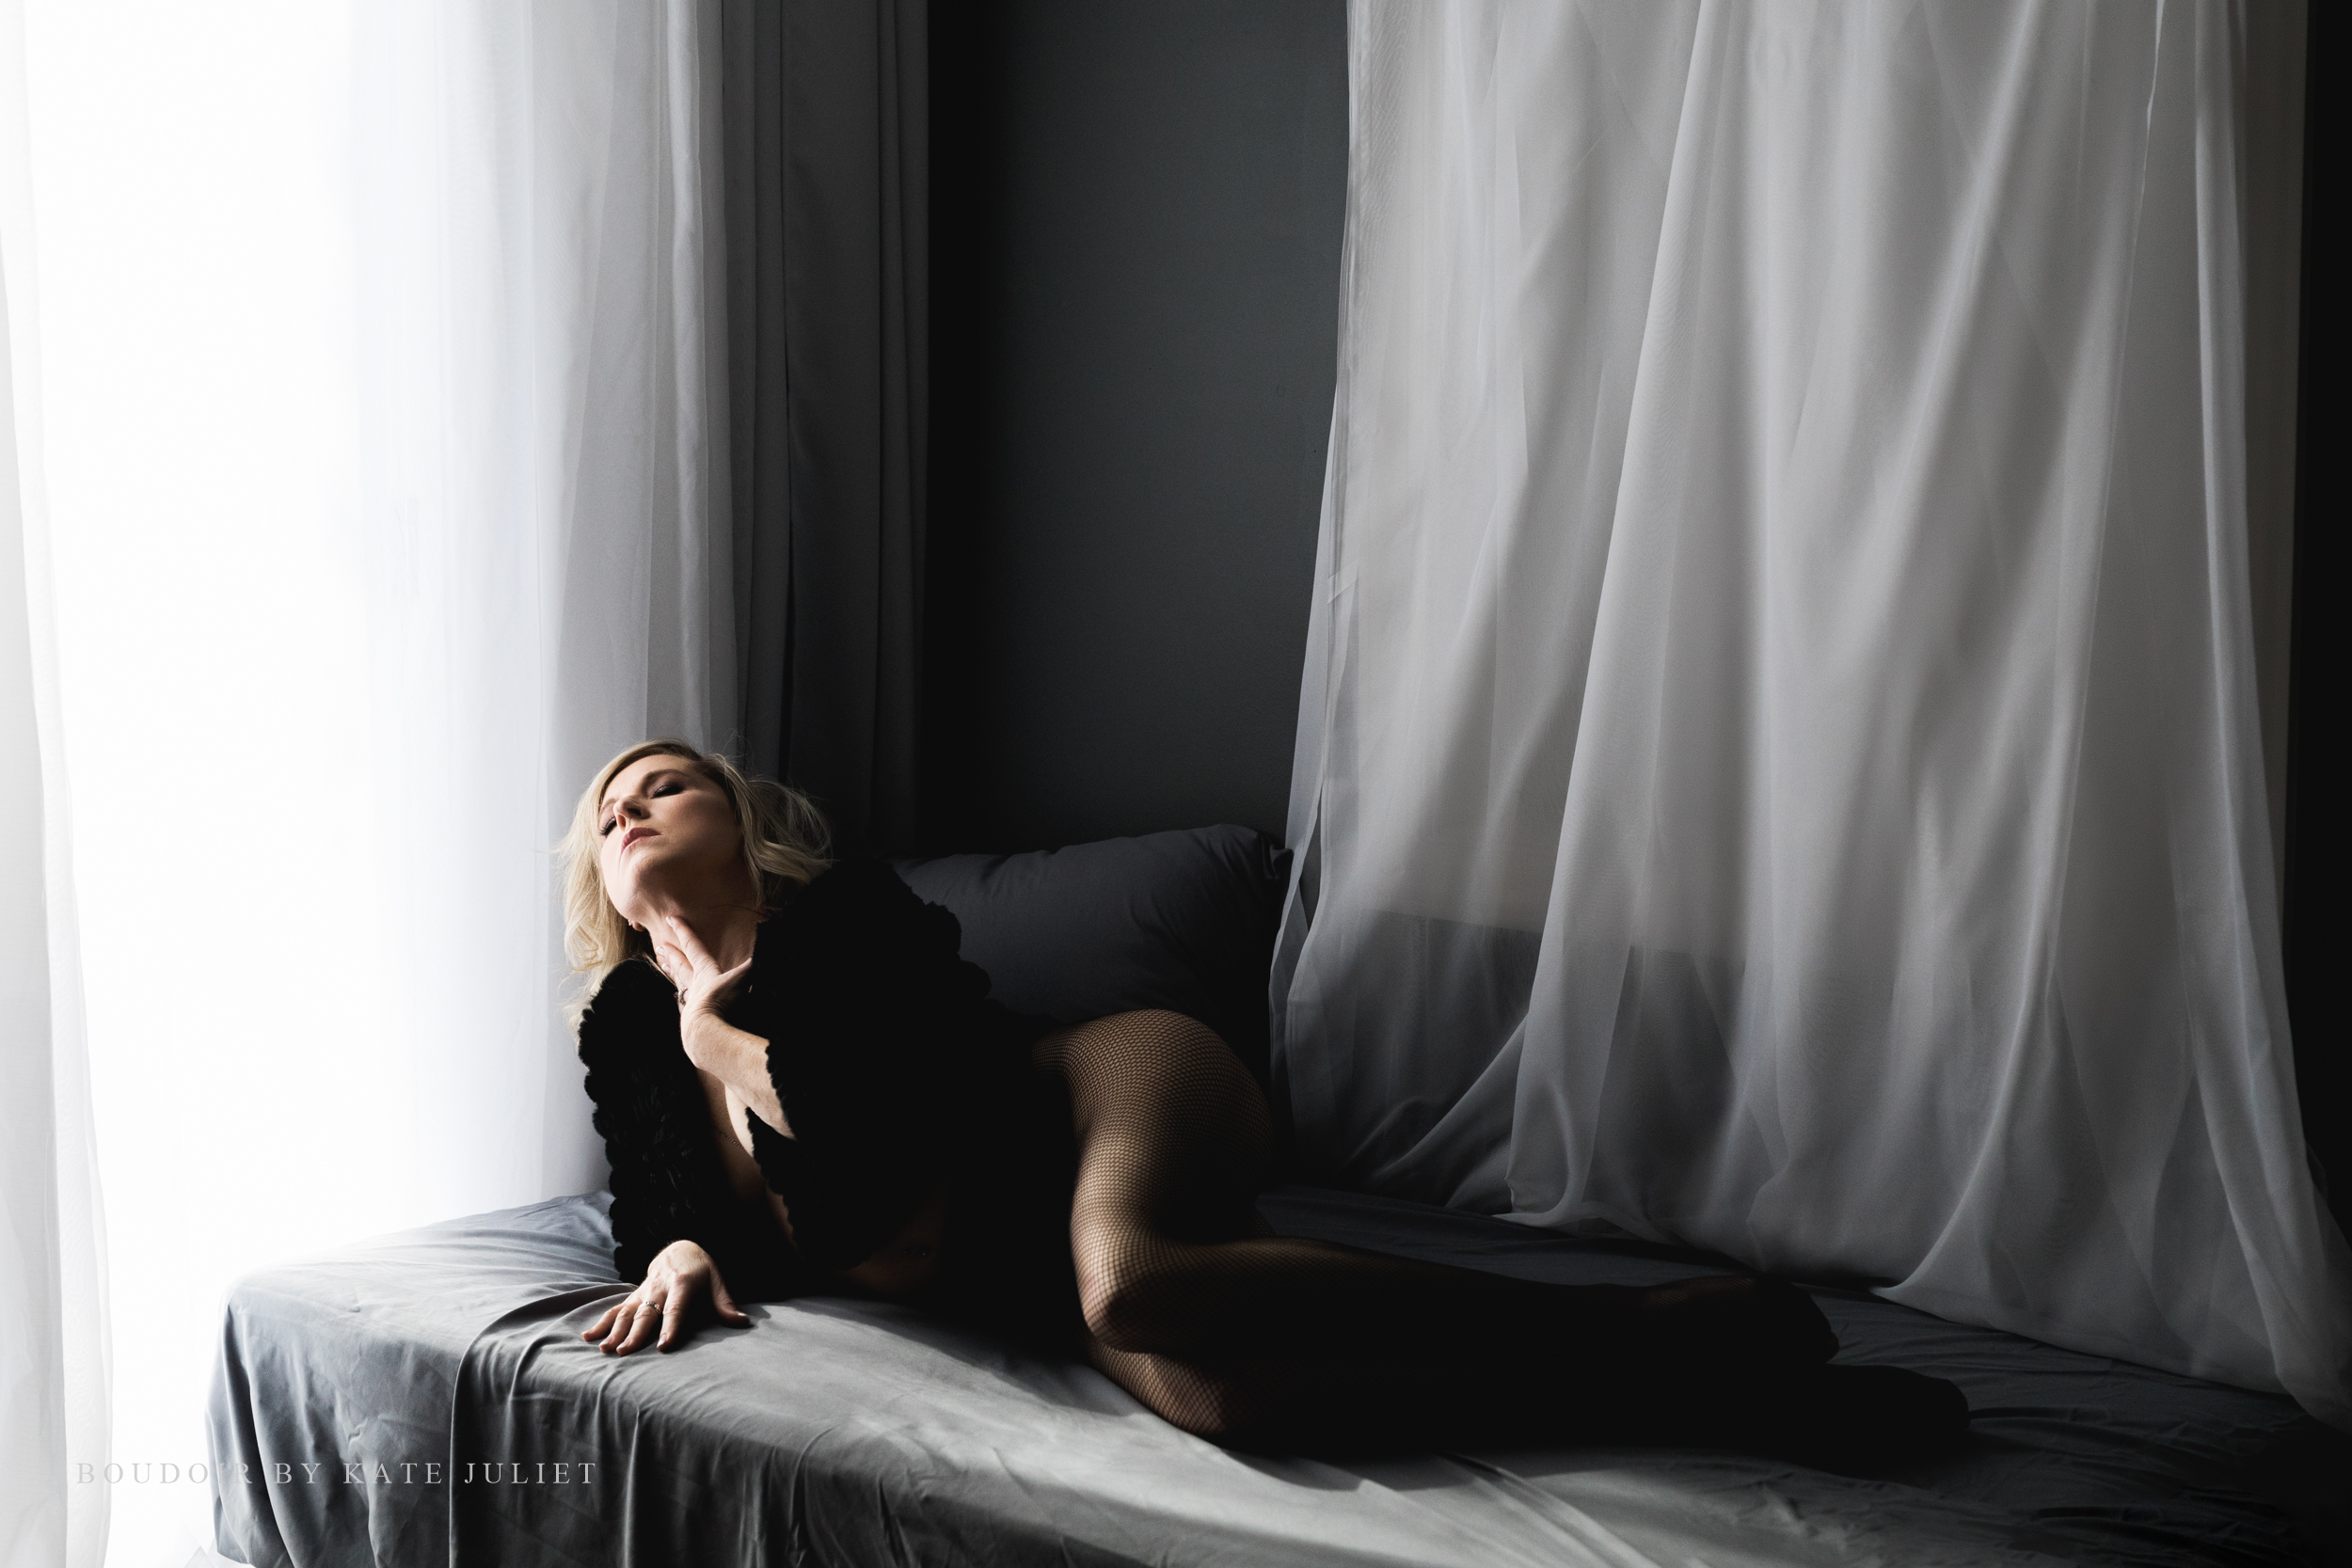 kate juliet photography - boudoir - web-125.jpg